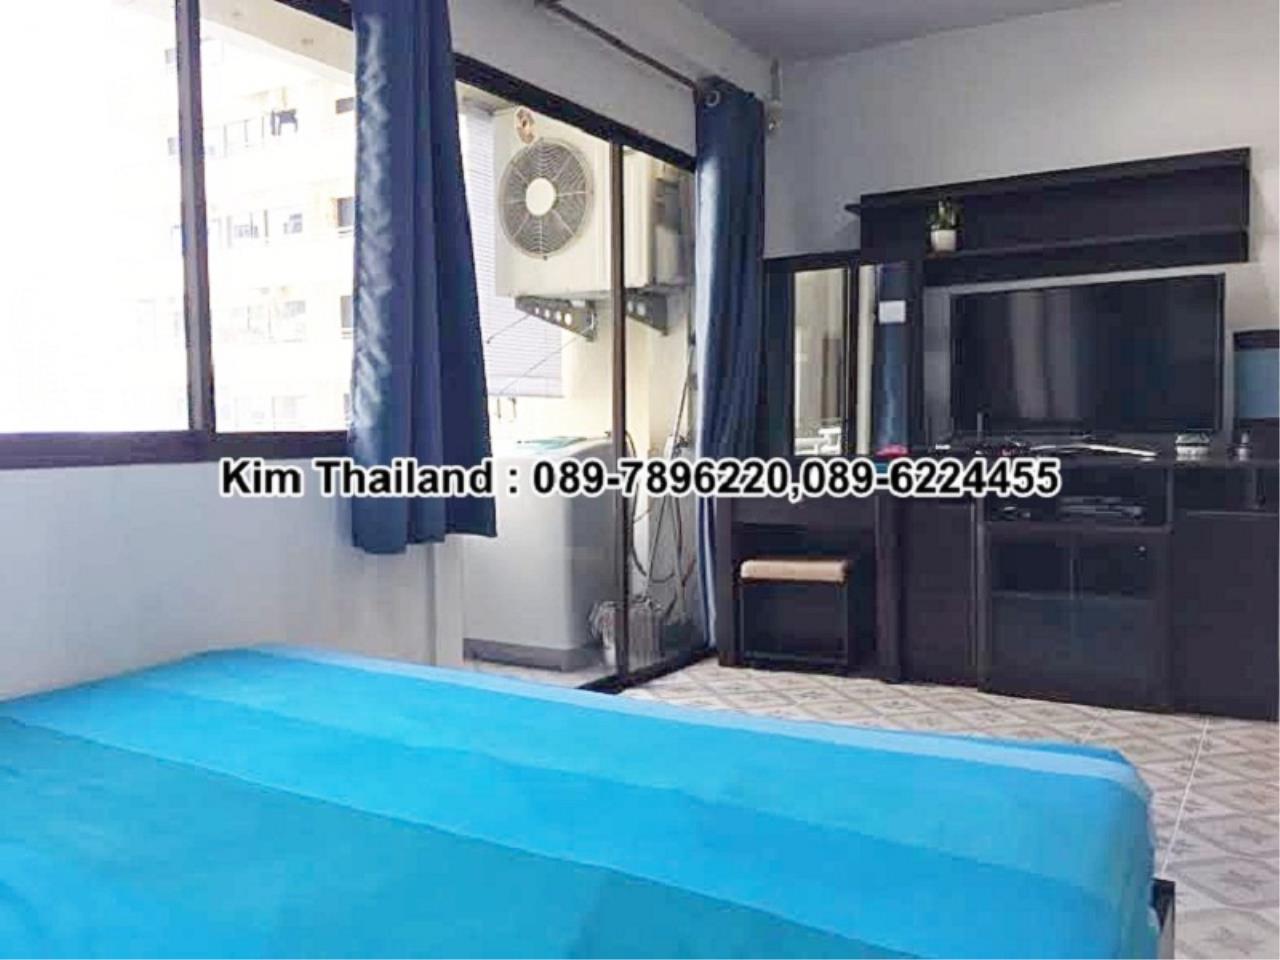 BKKcondorental Agency's For rent, Condo Saranjai Mansion. Area 35 sq.m. Studio. Rent 16,000baht/month 3